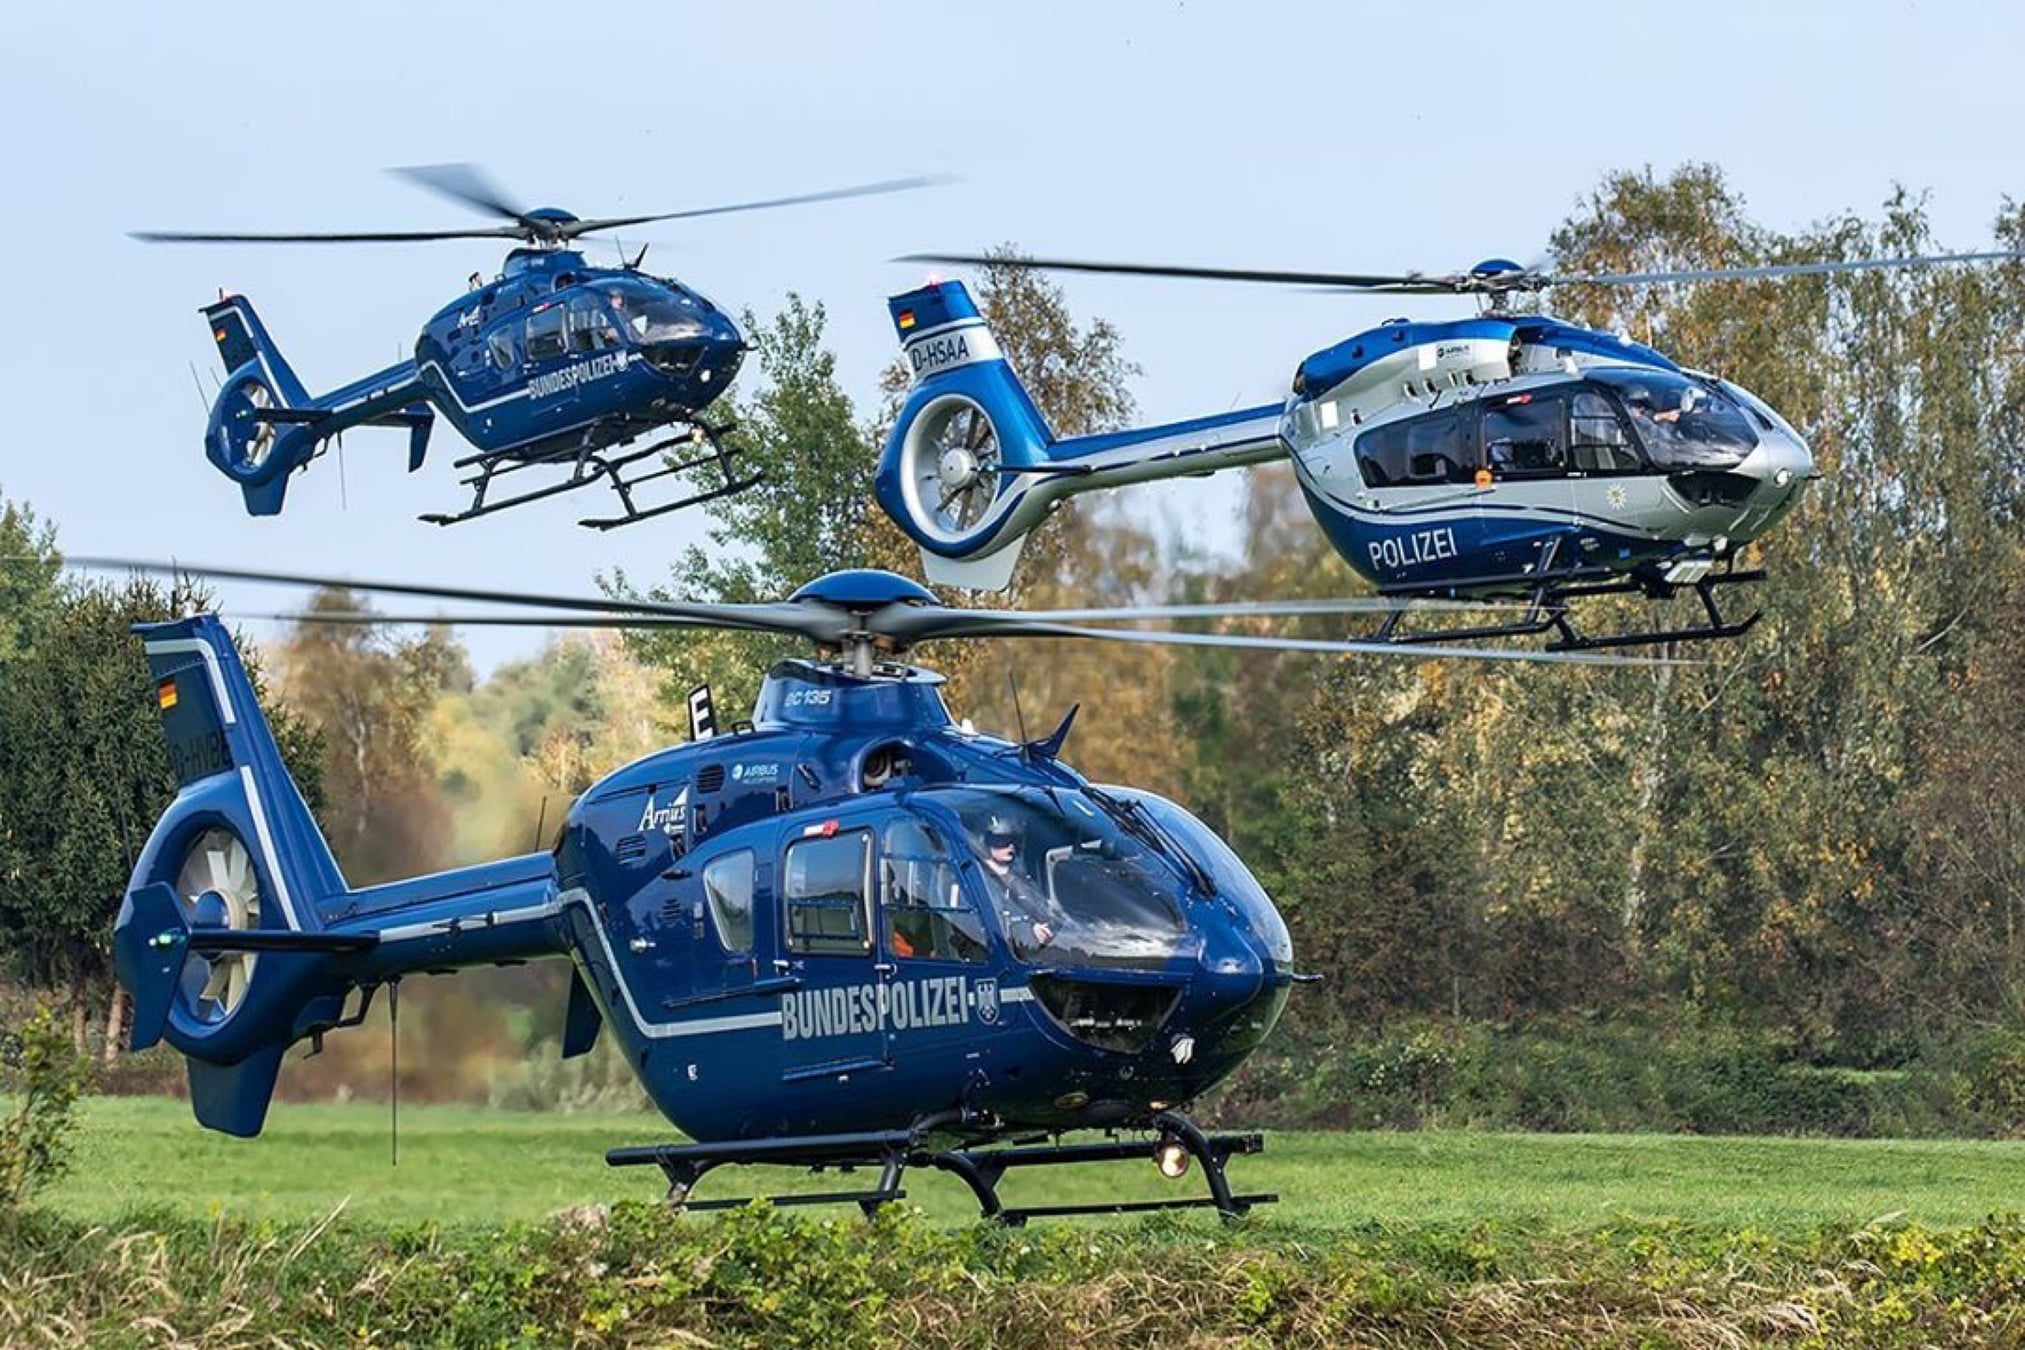 Bundespolizei Airbus EC135 and Polizei Sachsen-Anhalt H145 during annual mountain training. Photo submitted by Instagram user @aviationmedia_tomziegler using #verticalmag